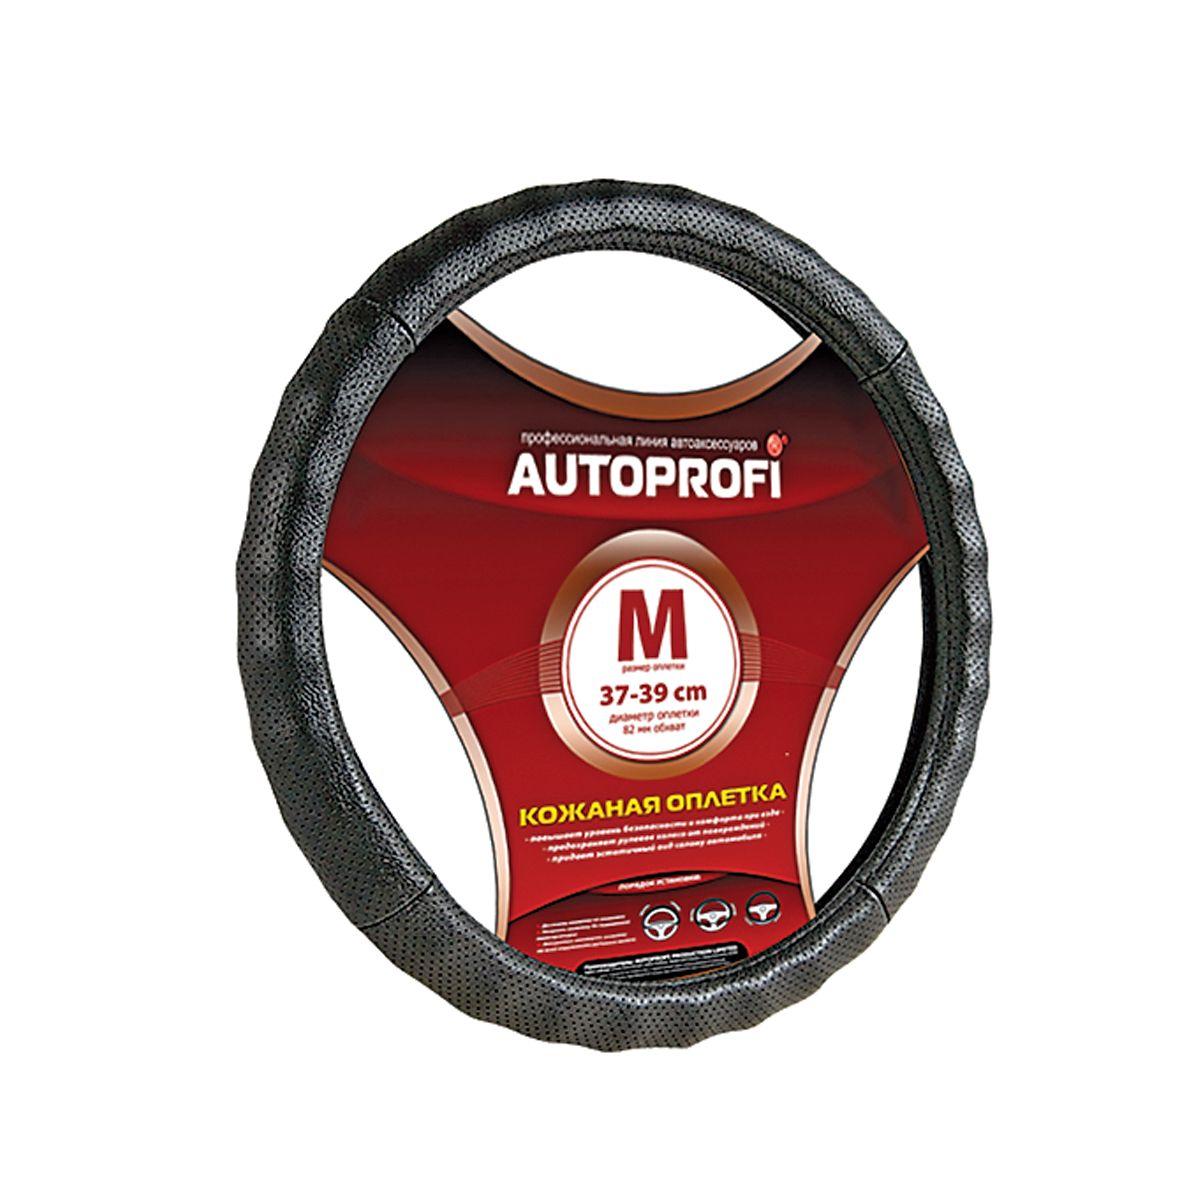 Оплетка Autoprofi Ap-396 bk (m) автохимия autoprofi антидождь 150503